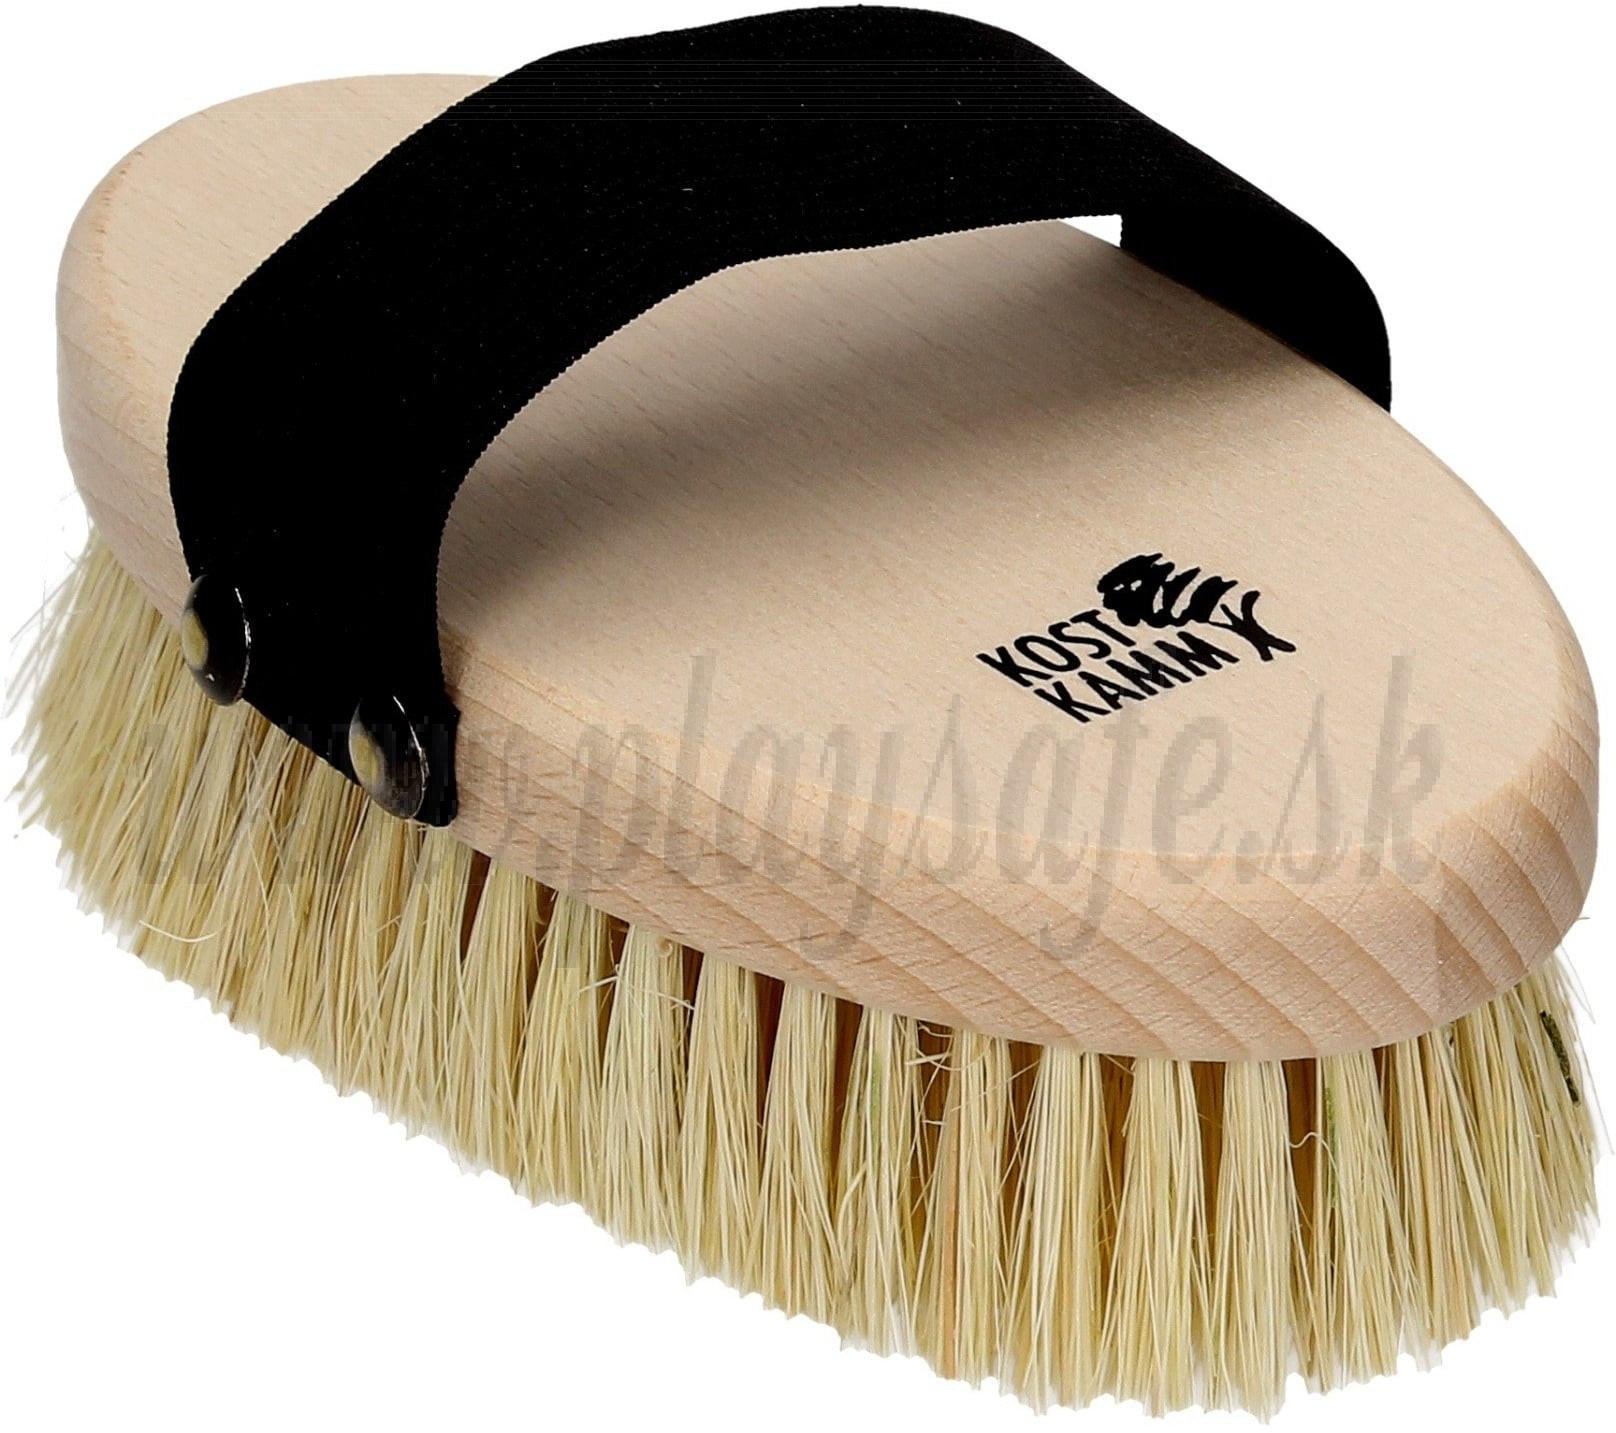 Kostkamm Oval Massage Brush